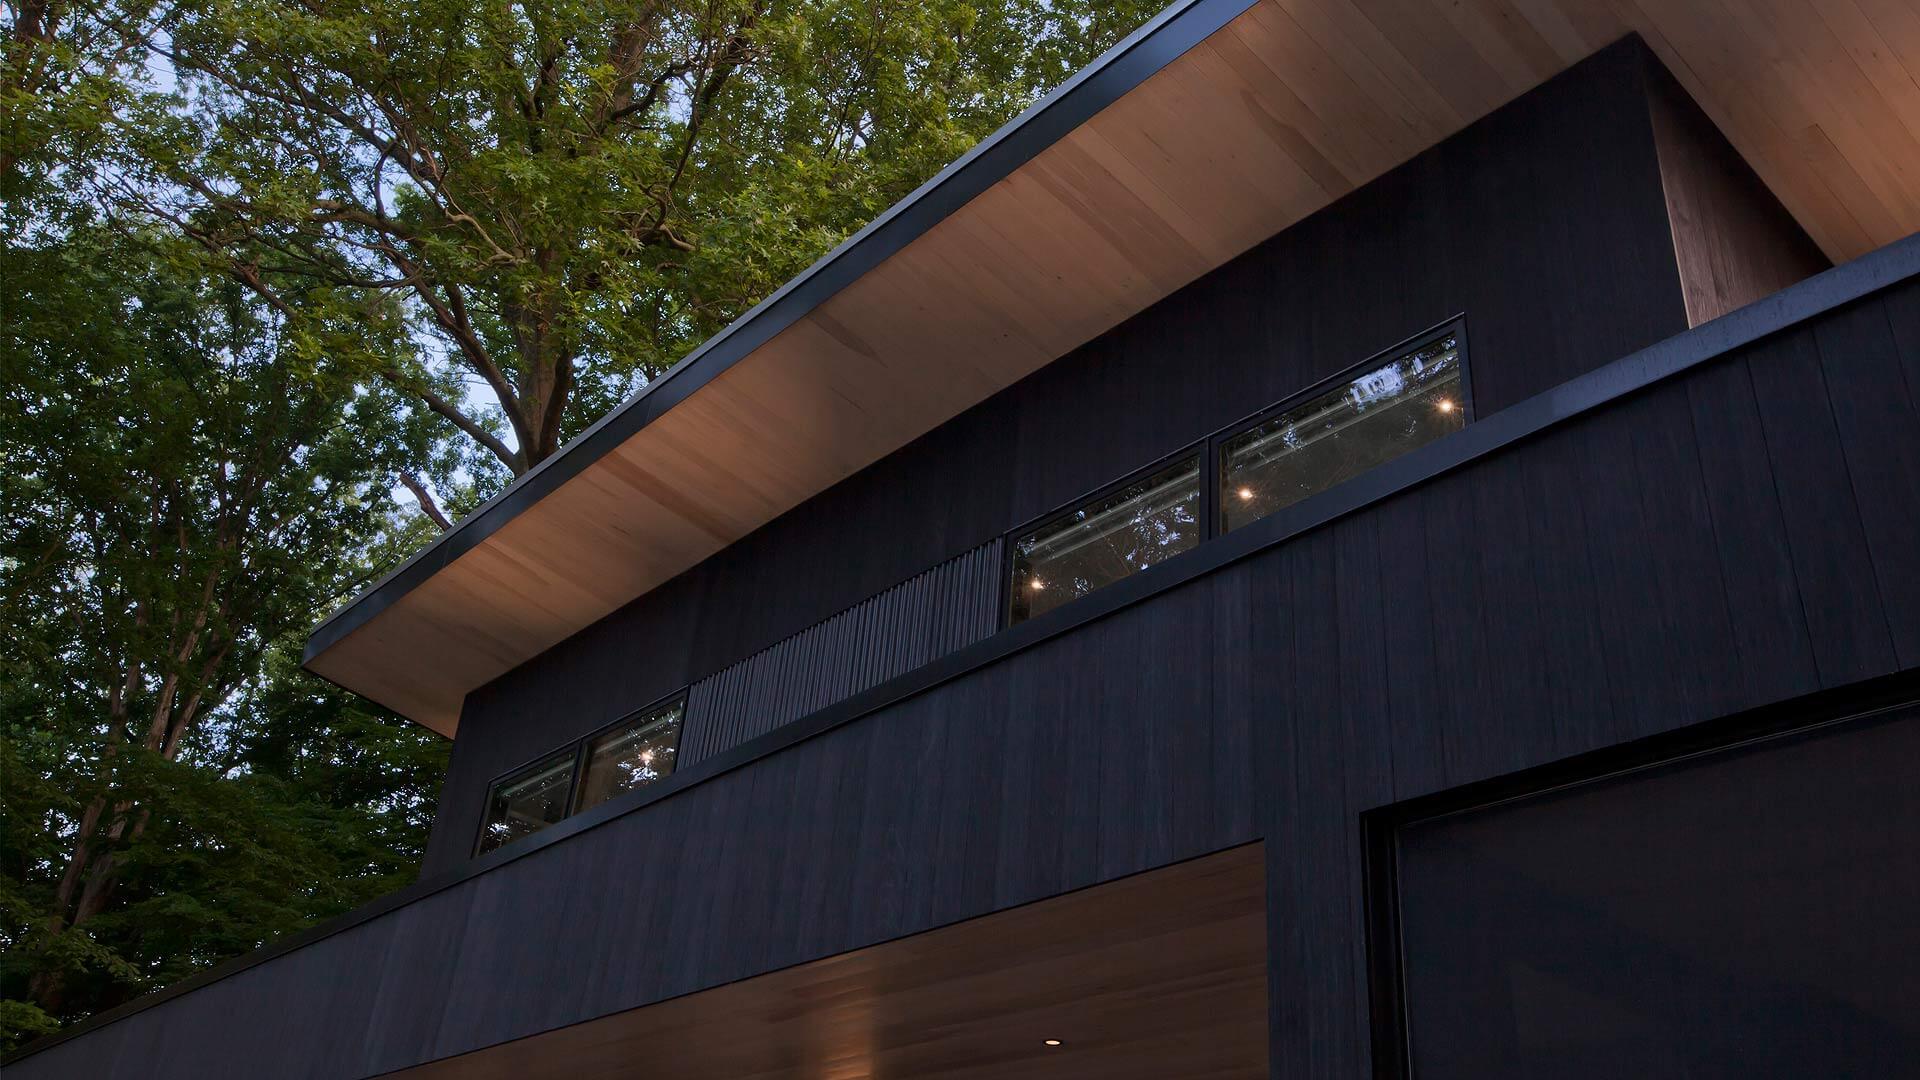 Eastern White Pine Soffit contrasts with Shou Sugi Ban Charred Wood Black Siding and black corrugated metal - Lakeside Modern Cottage (H-LODGE) - Unionville, Indiana, Lake Lemon